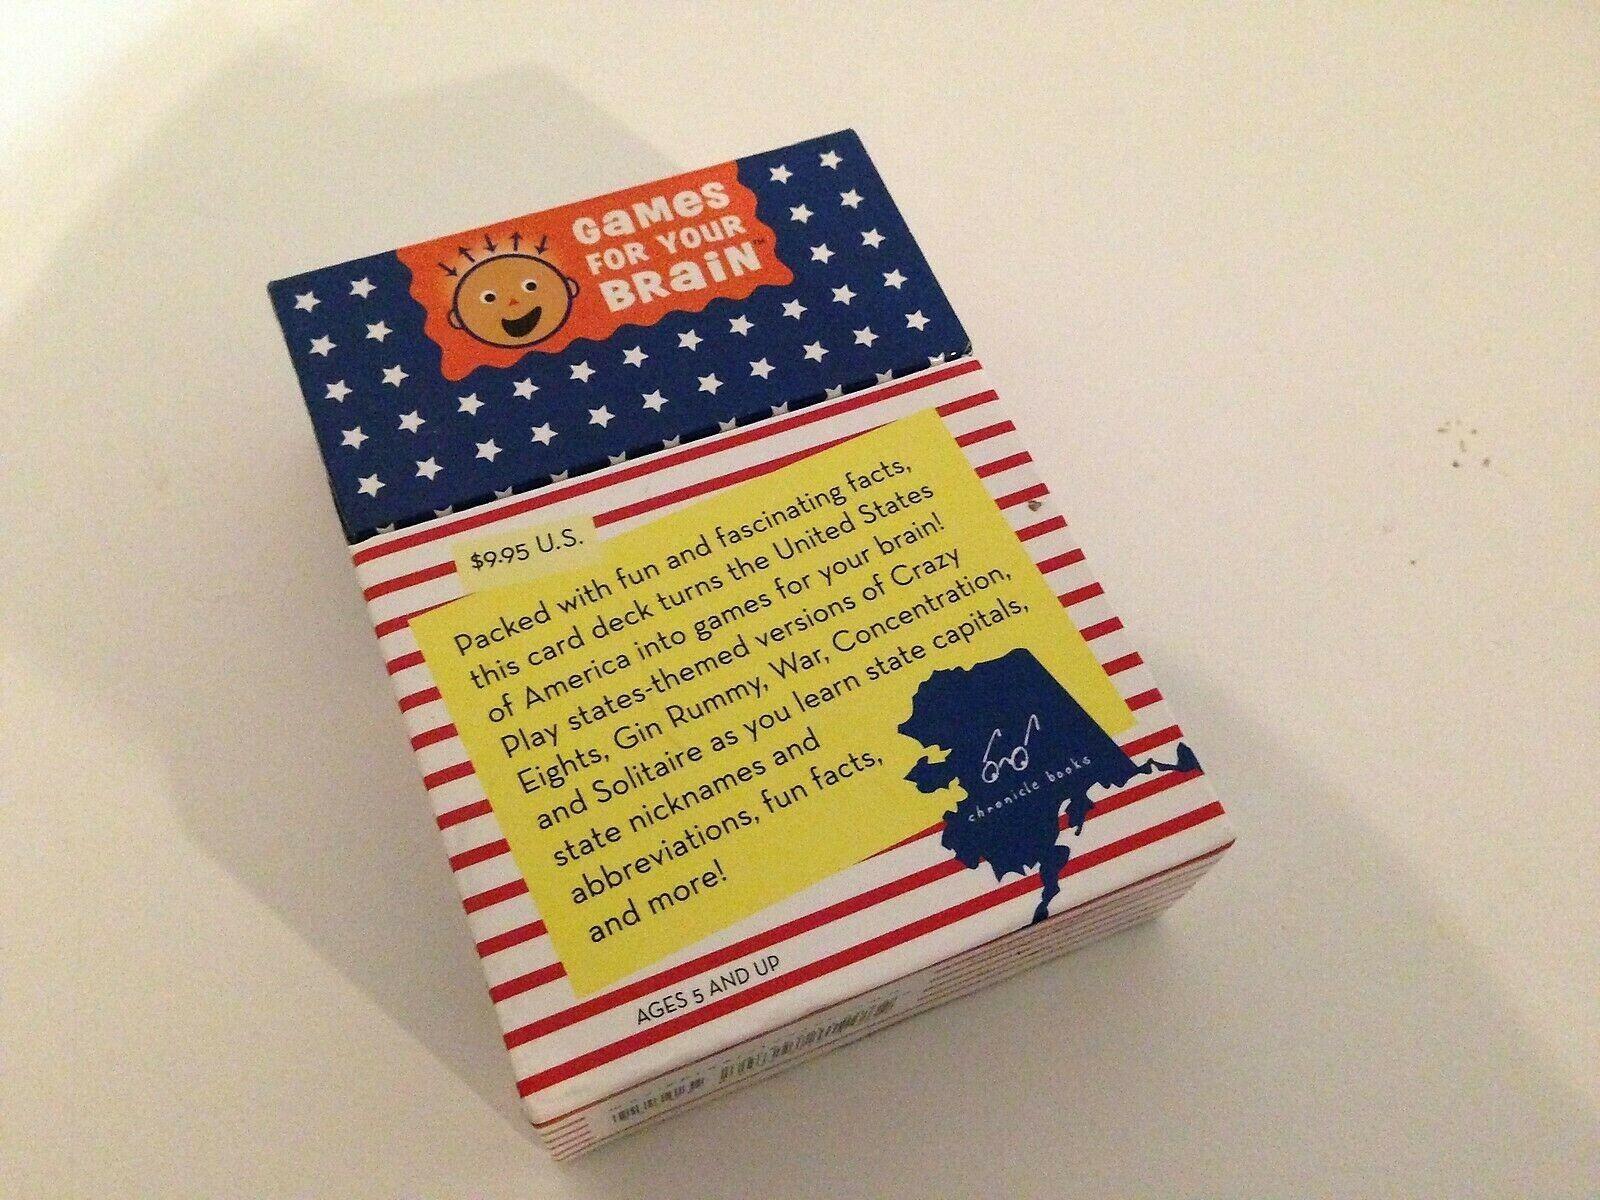 giocos For Your Brain Brain Brain United States autod gioco Crazy 8's War Gin Rummy Solitaire.. 679256